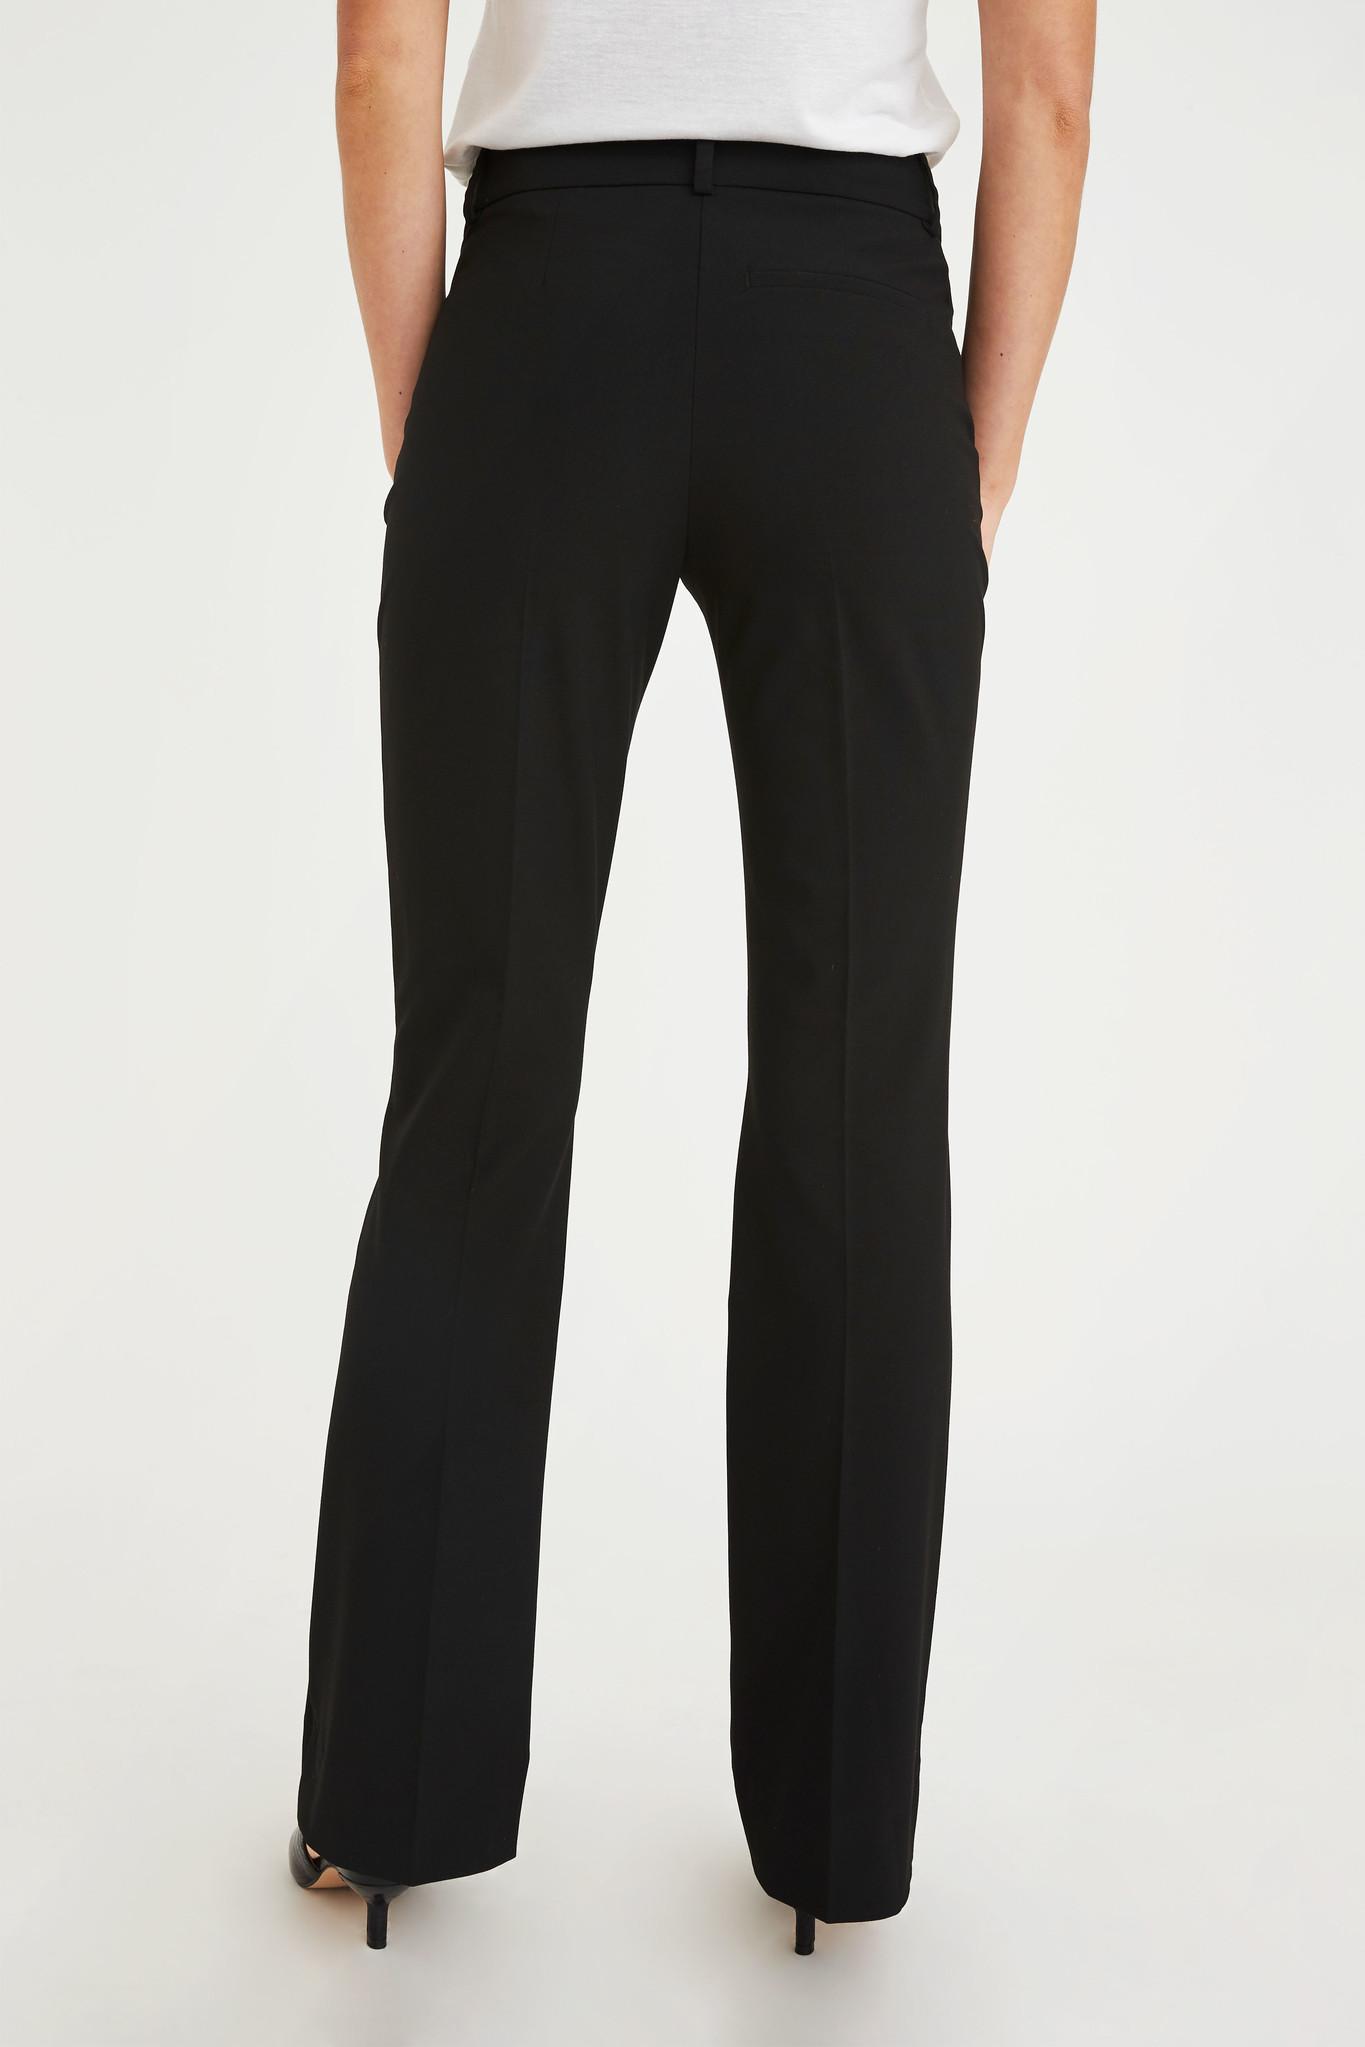 Clara 285 Long Pants - Black Glow-3